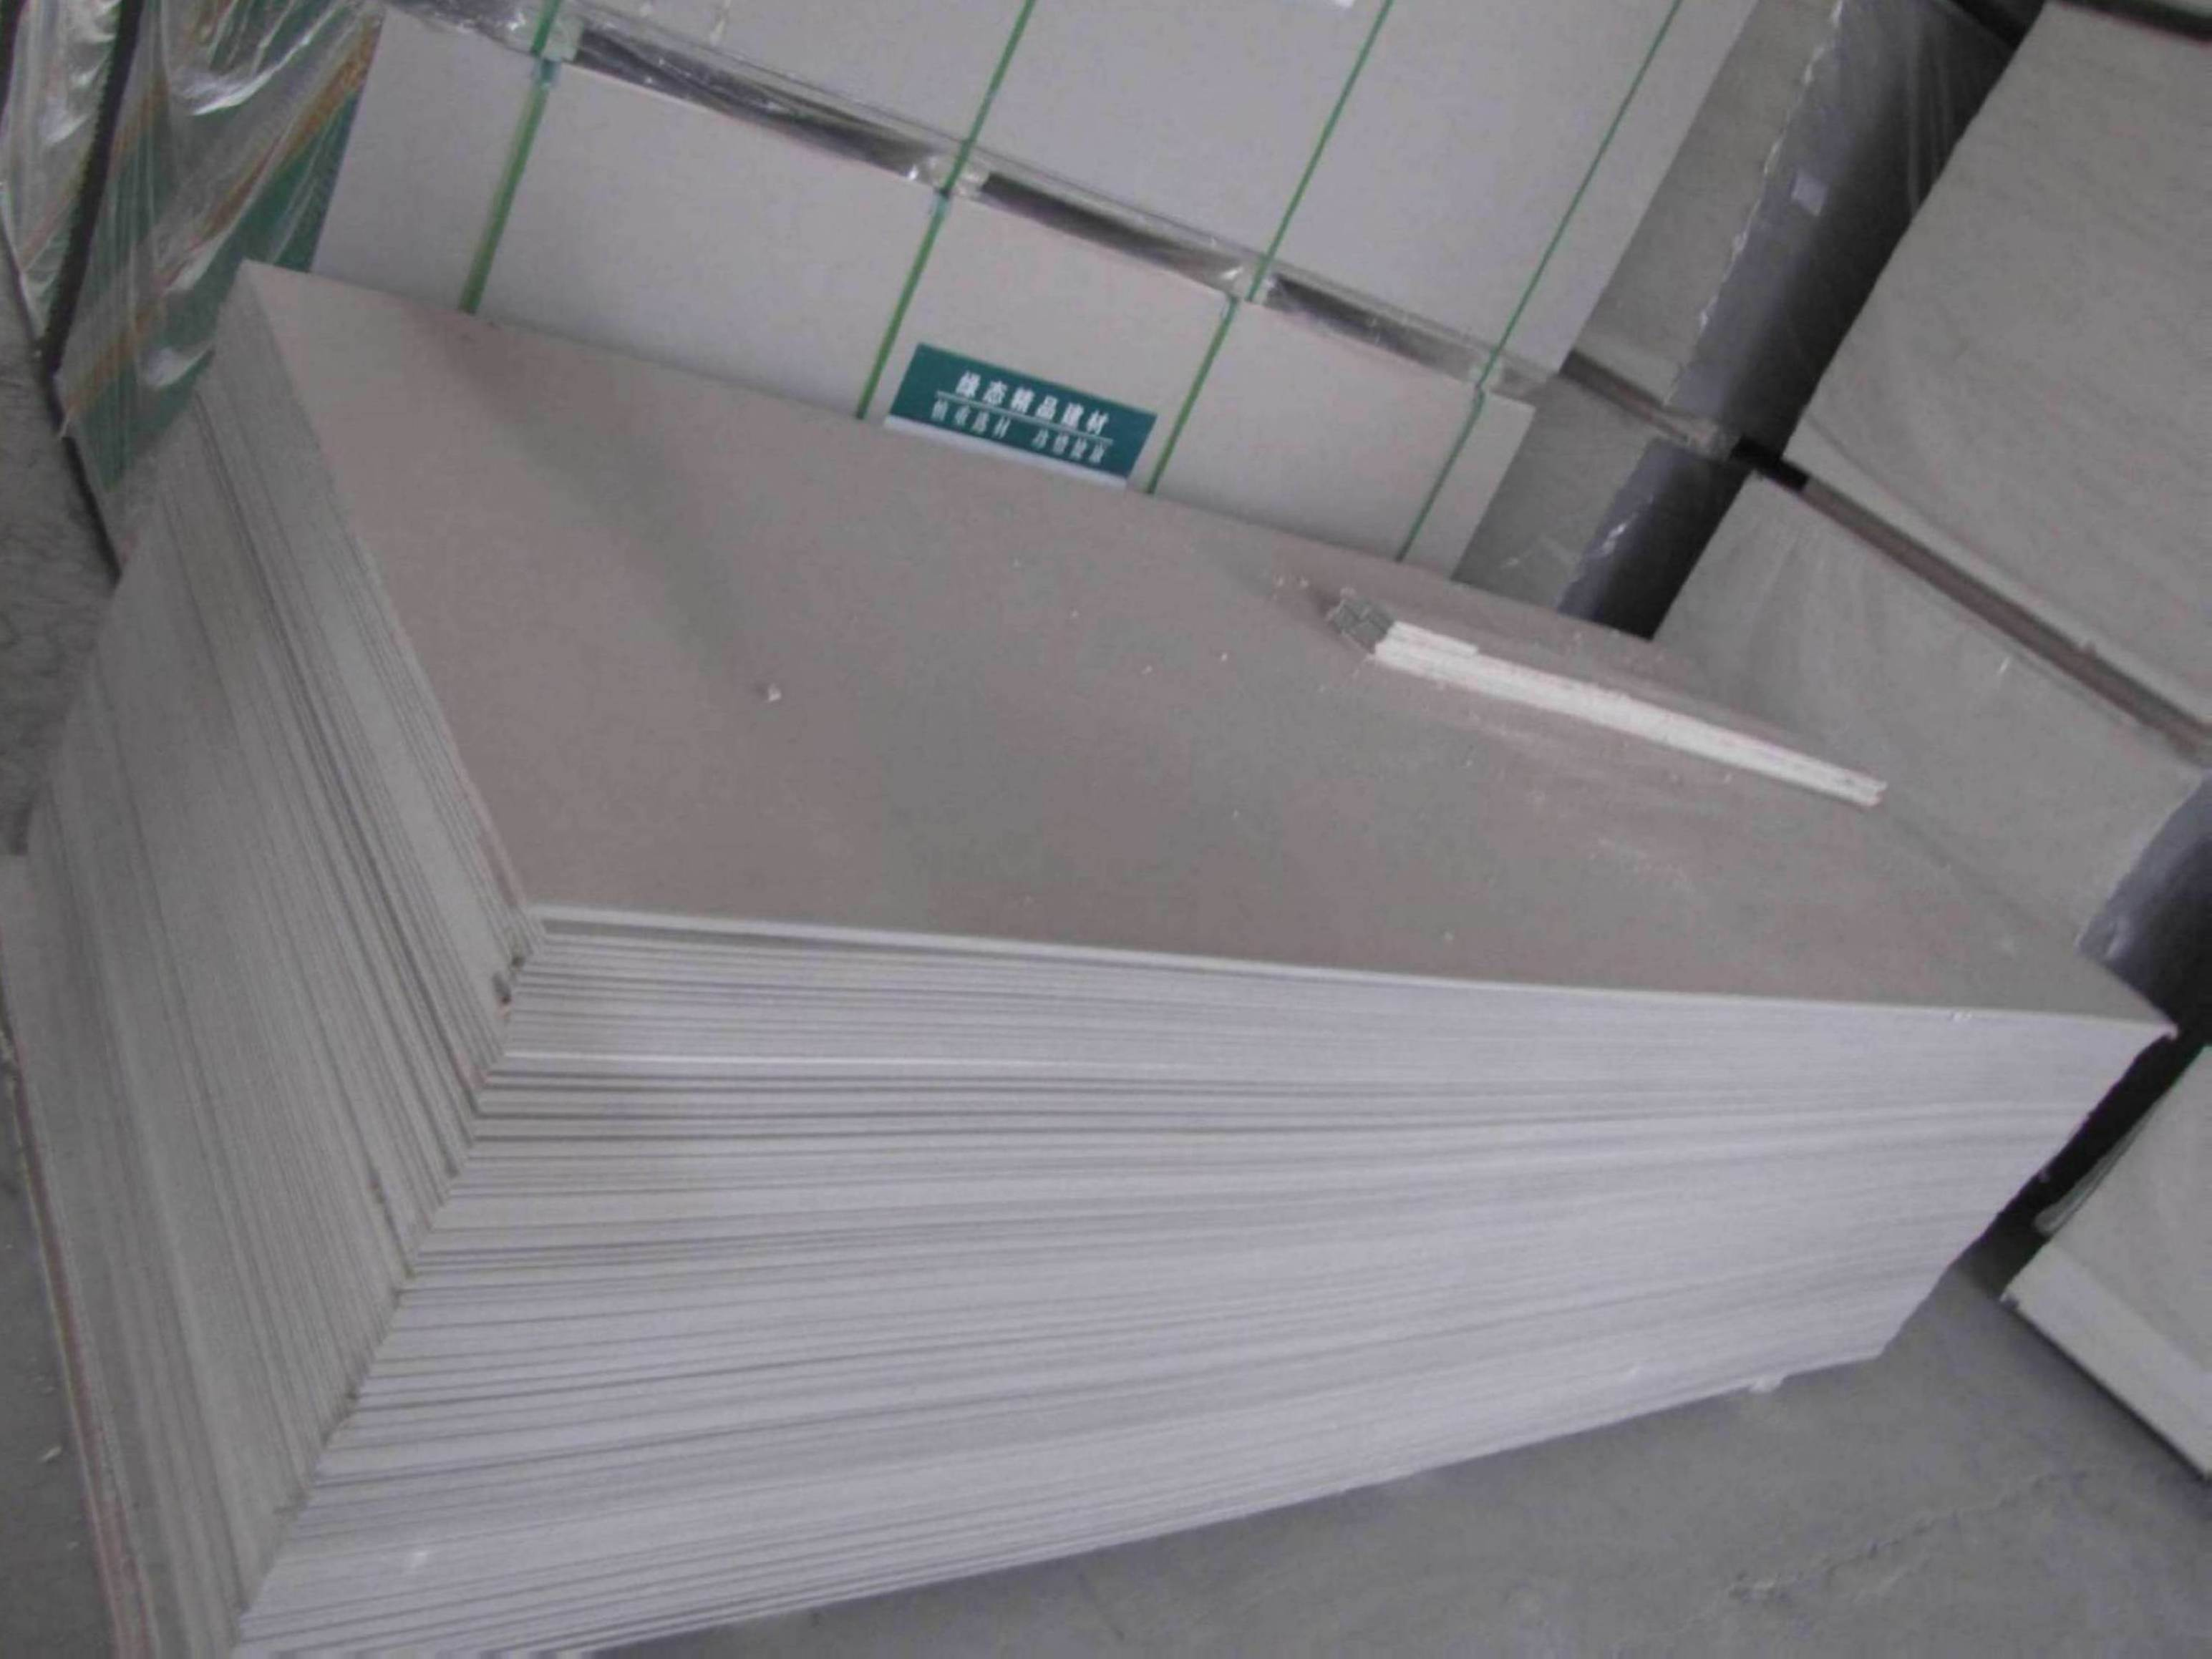 Board gypsum buy gypsum for Gypsum board images